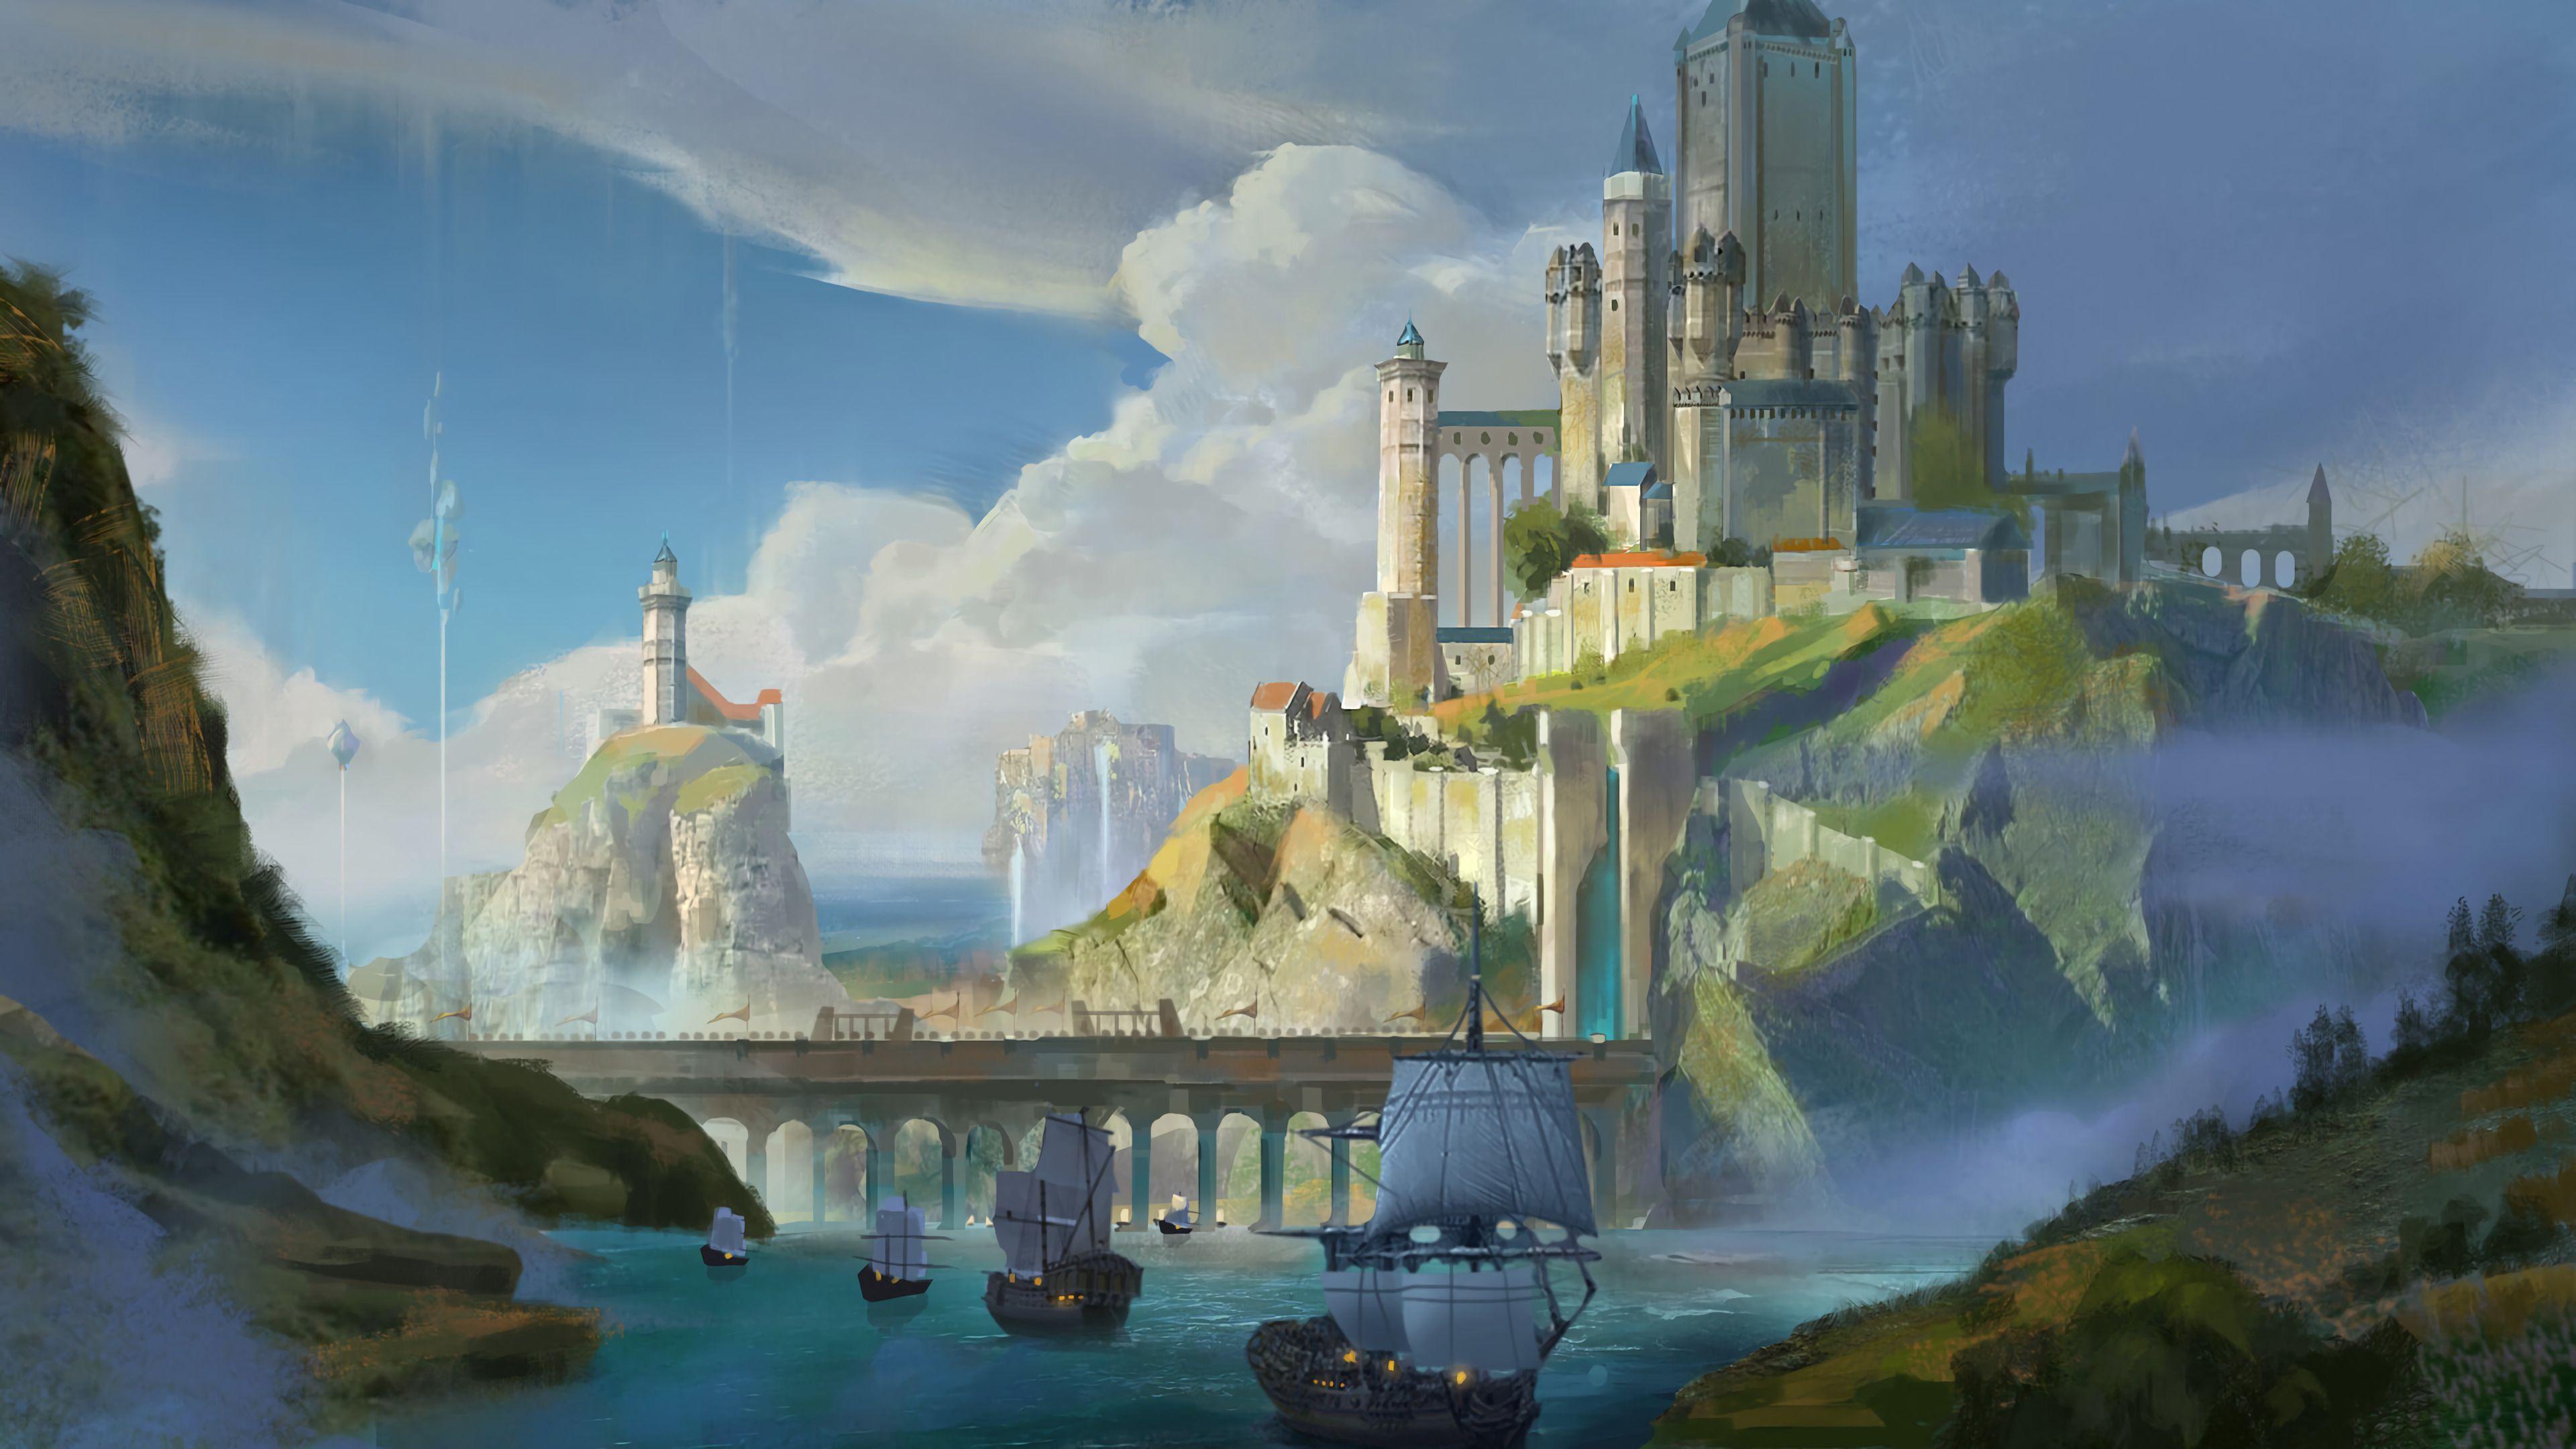 91814 download wallpaper Ships, Lock, Rocks, Bridge, Art screensavers and pictures for free